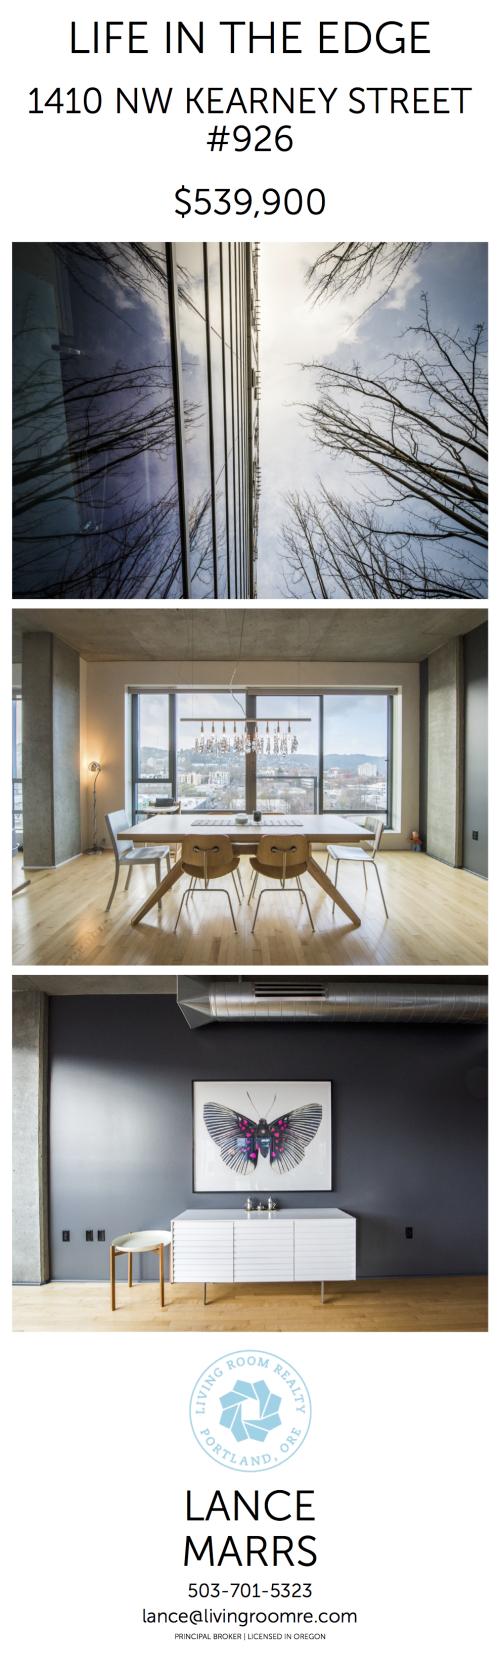 Lance_PortlandArchitecture_Ad